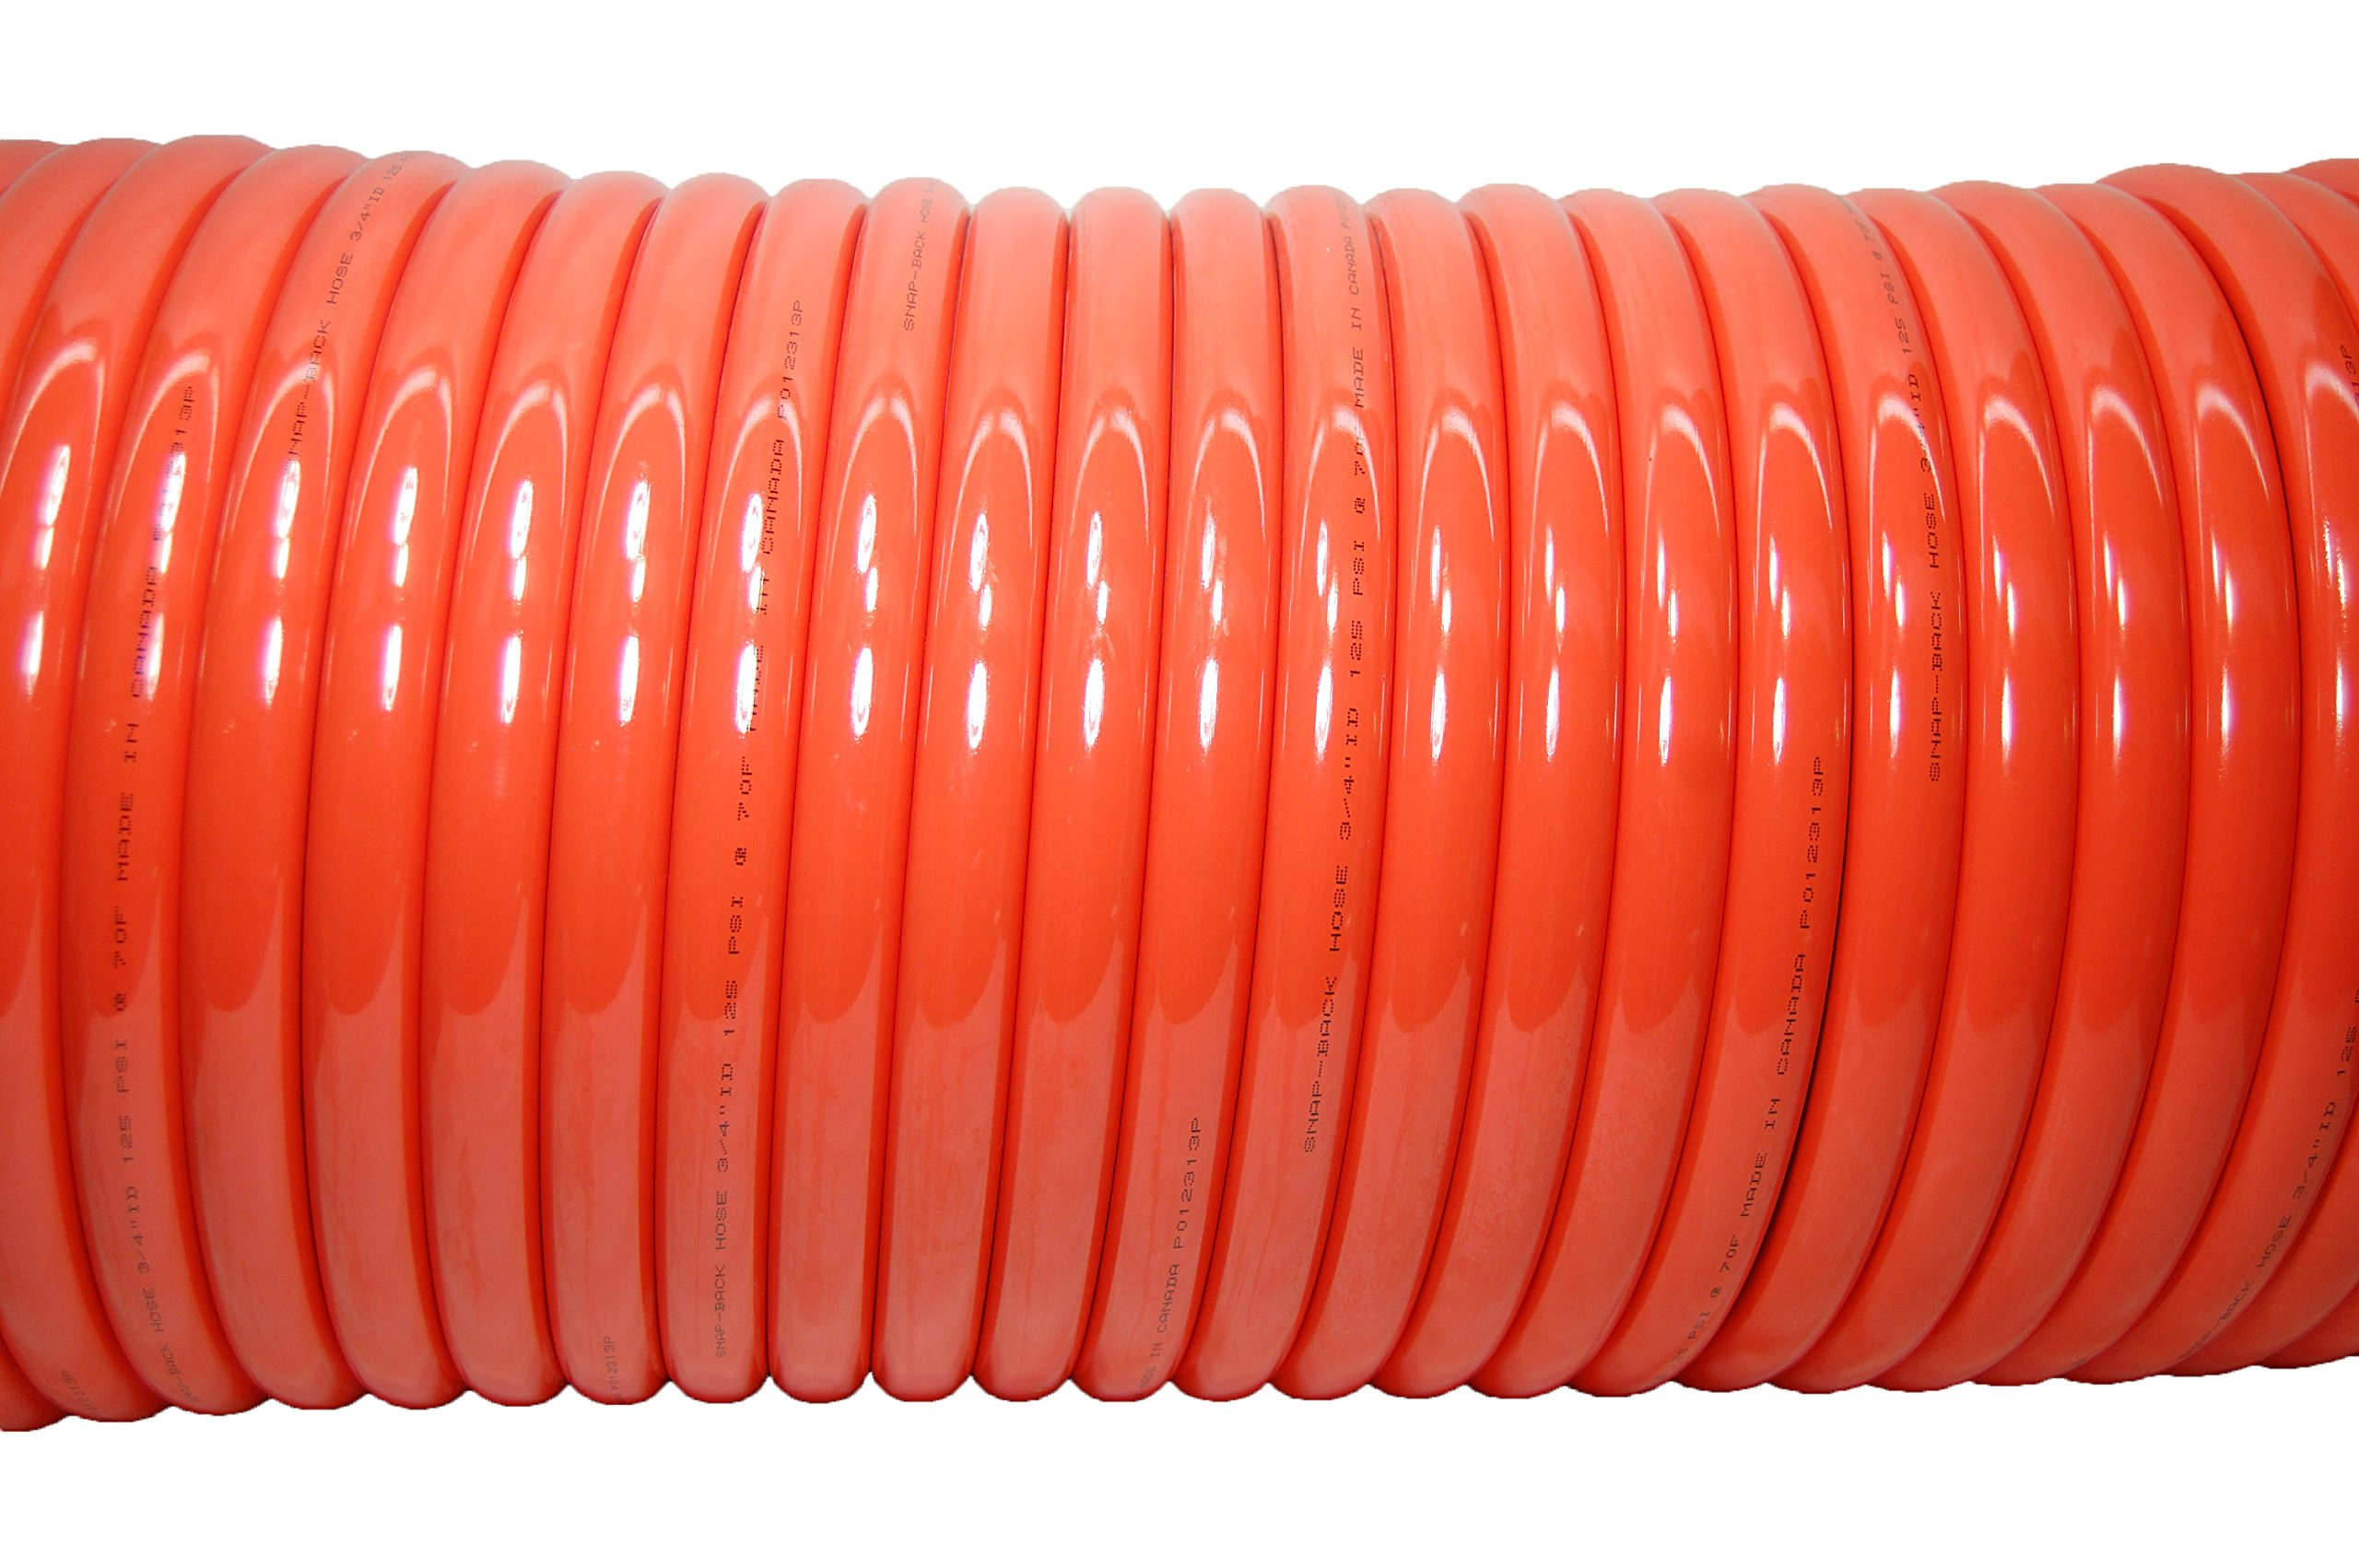 Plastair Industrial SBH9100-91-6-U Copolymer Snapback Recoil Air Hose, 100' Length, 0.875'' Coil OD, 185 PSI Maximum Pressure, 0.75'' Coil ID